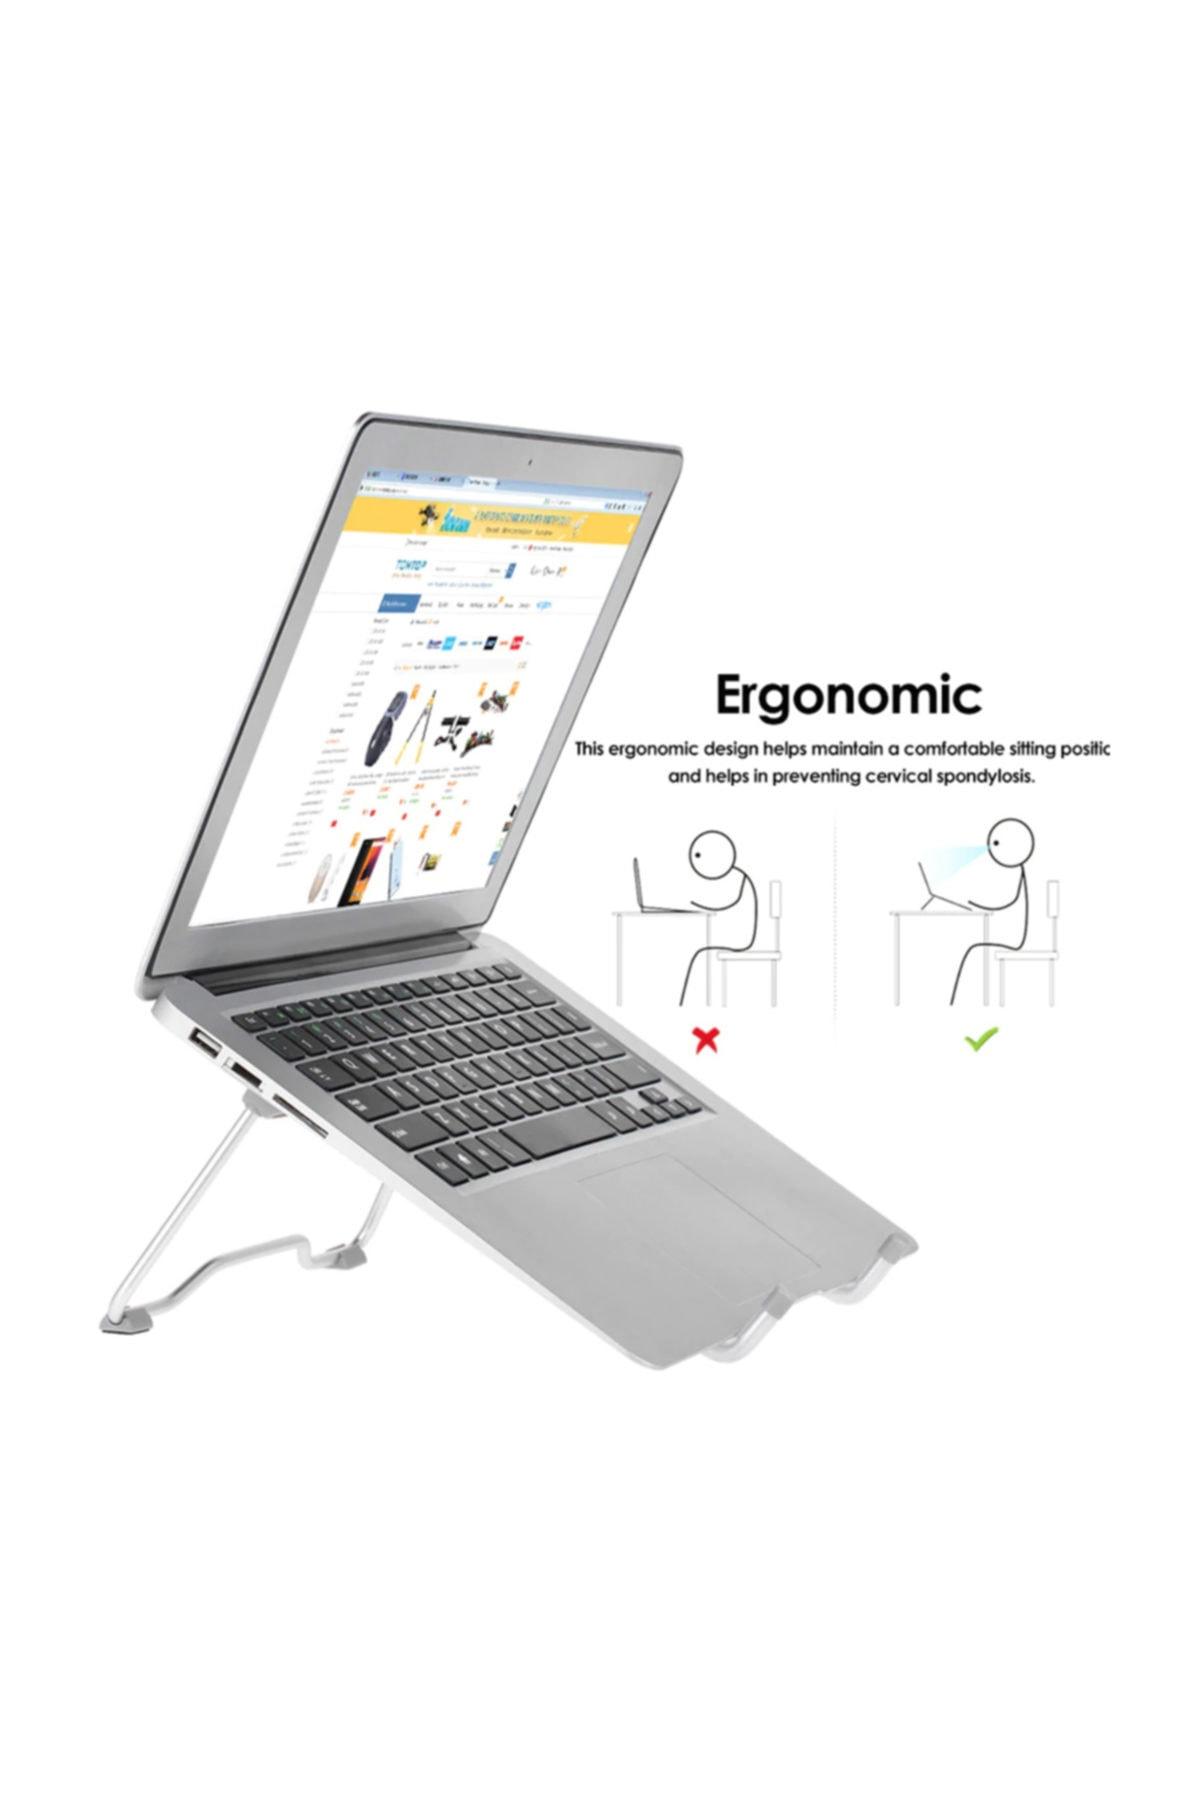 Weather Forecast Alüminyum Ayarlı Laptop Tablet Notebook Yükseltici Tutucu 2